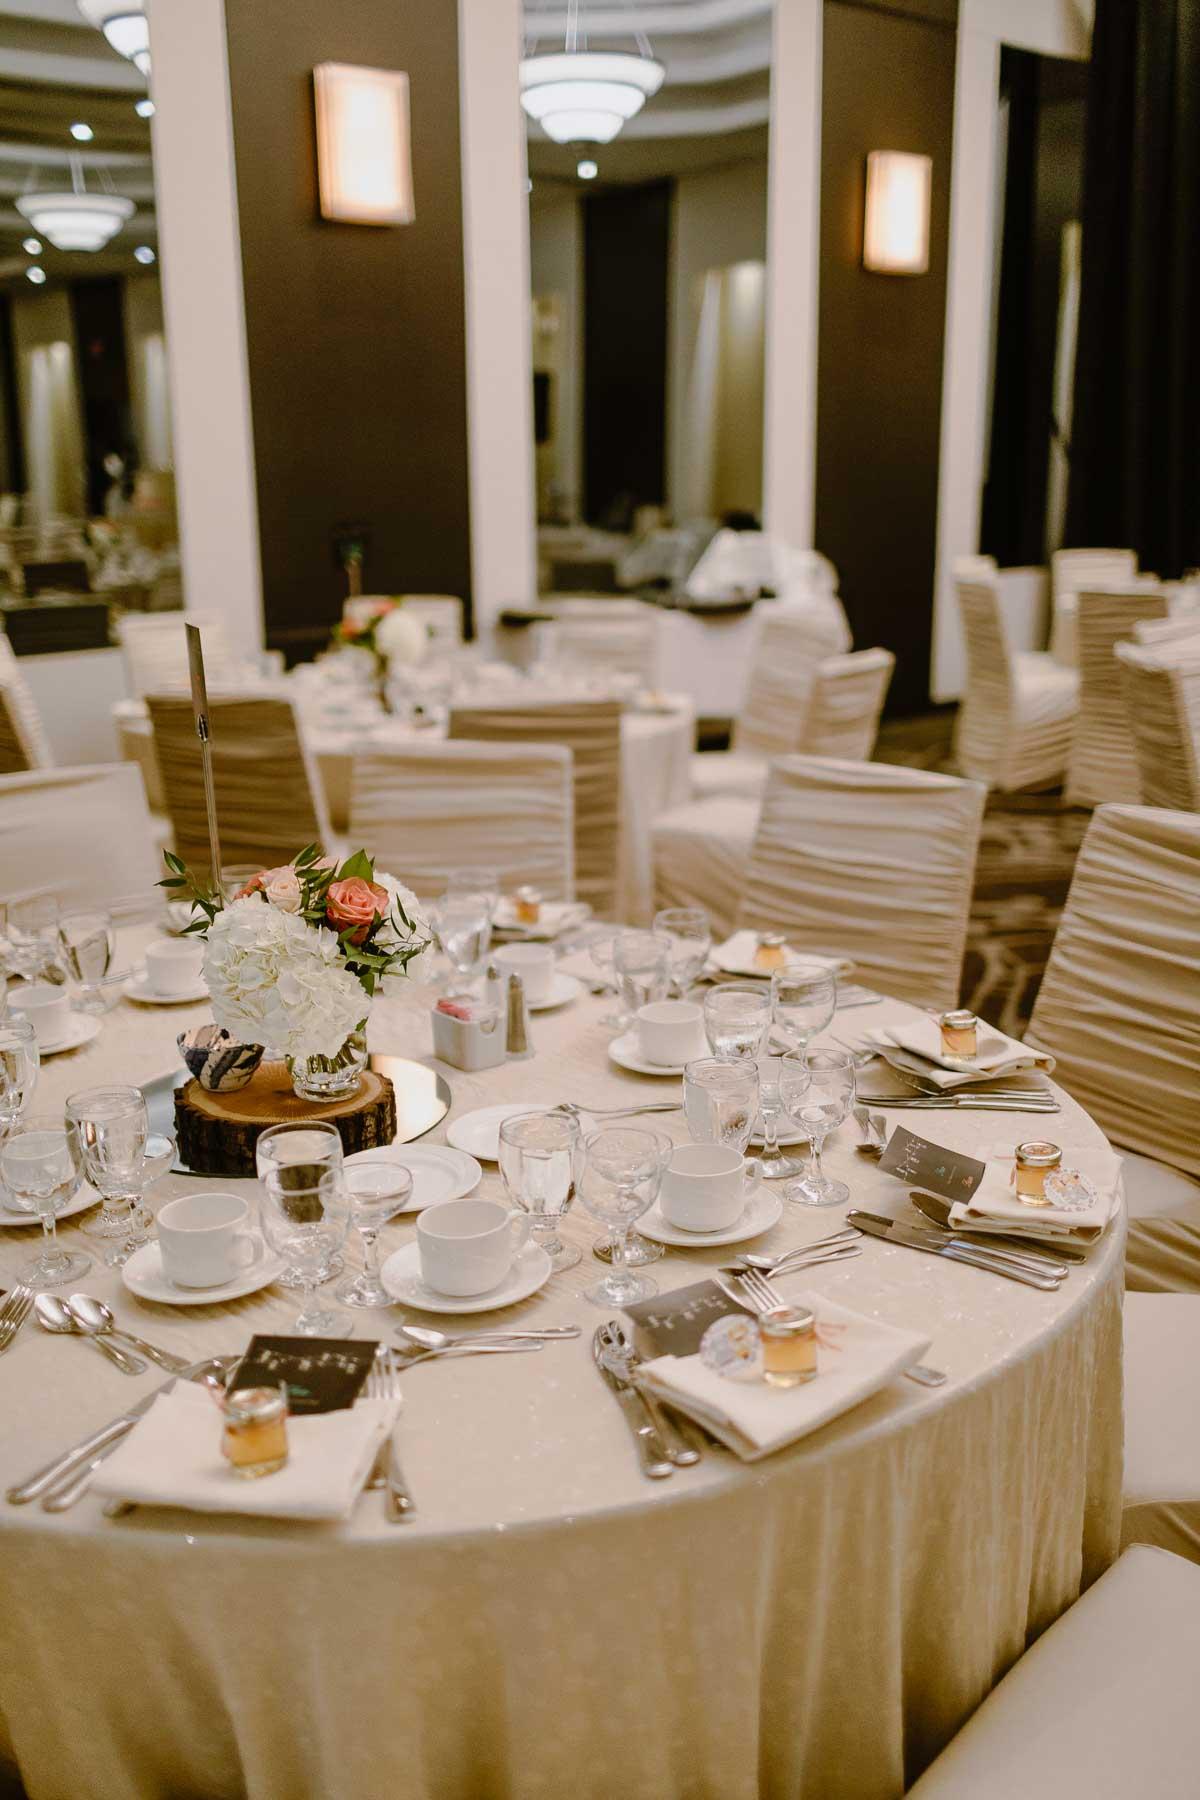 hilton-markham-wedding-toronto-chinese-wedding 0054.jpg